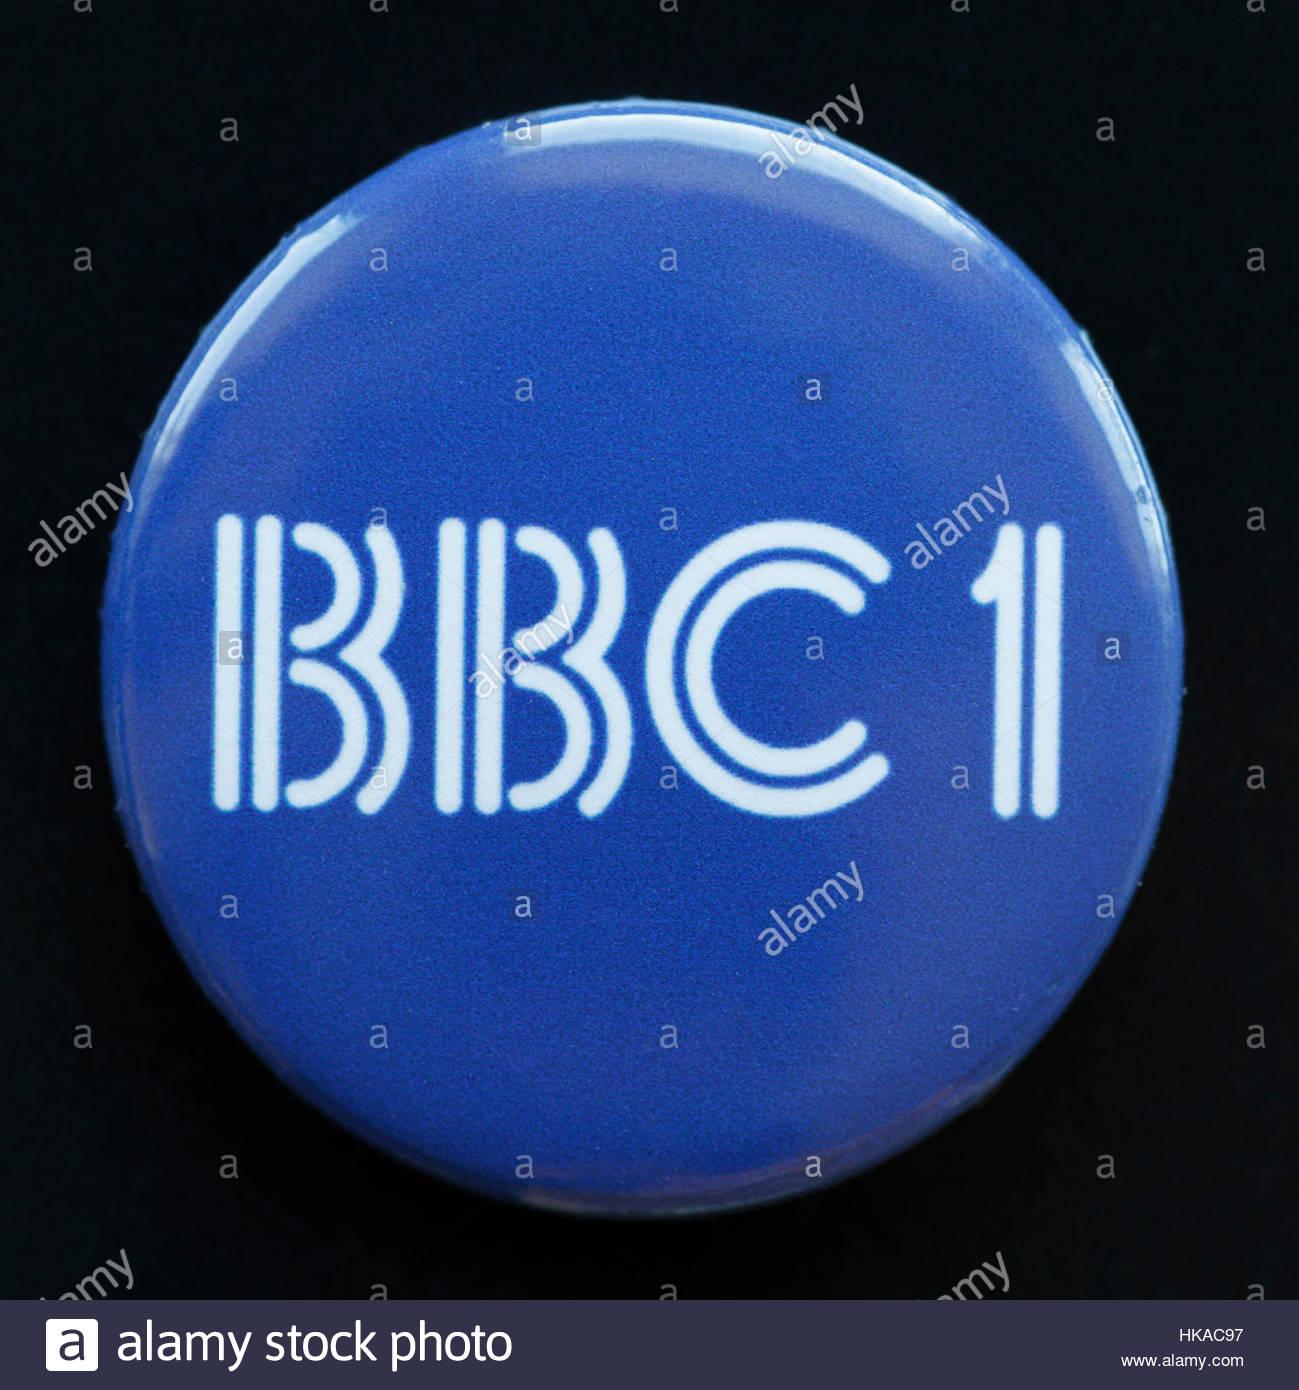 BBC1 Television Logo on a pin badge - Stock Image